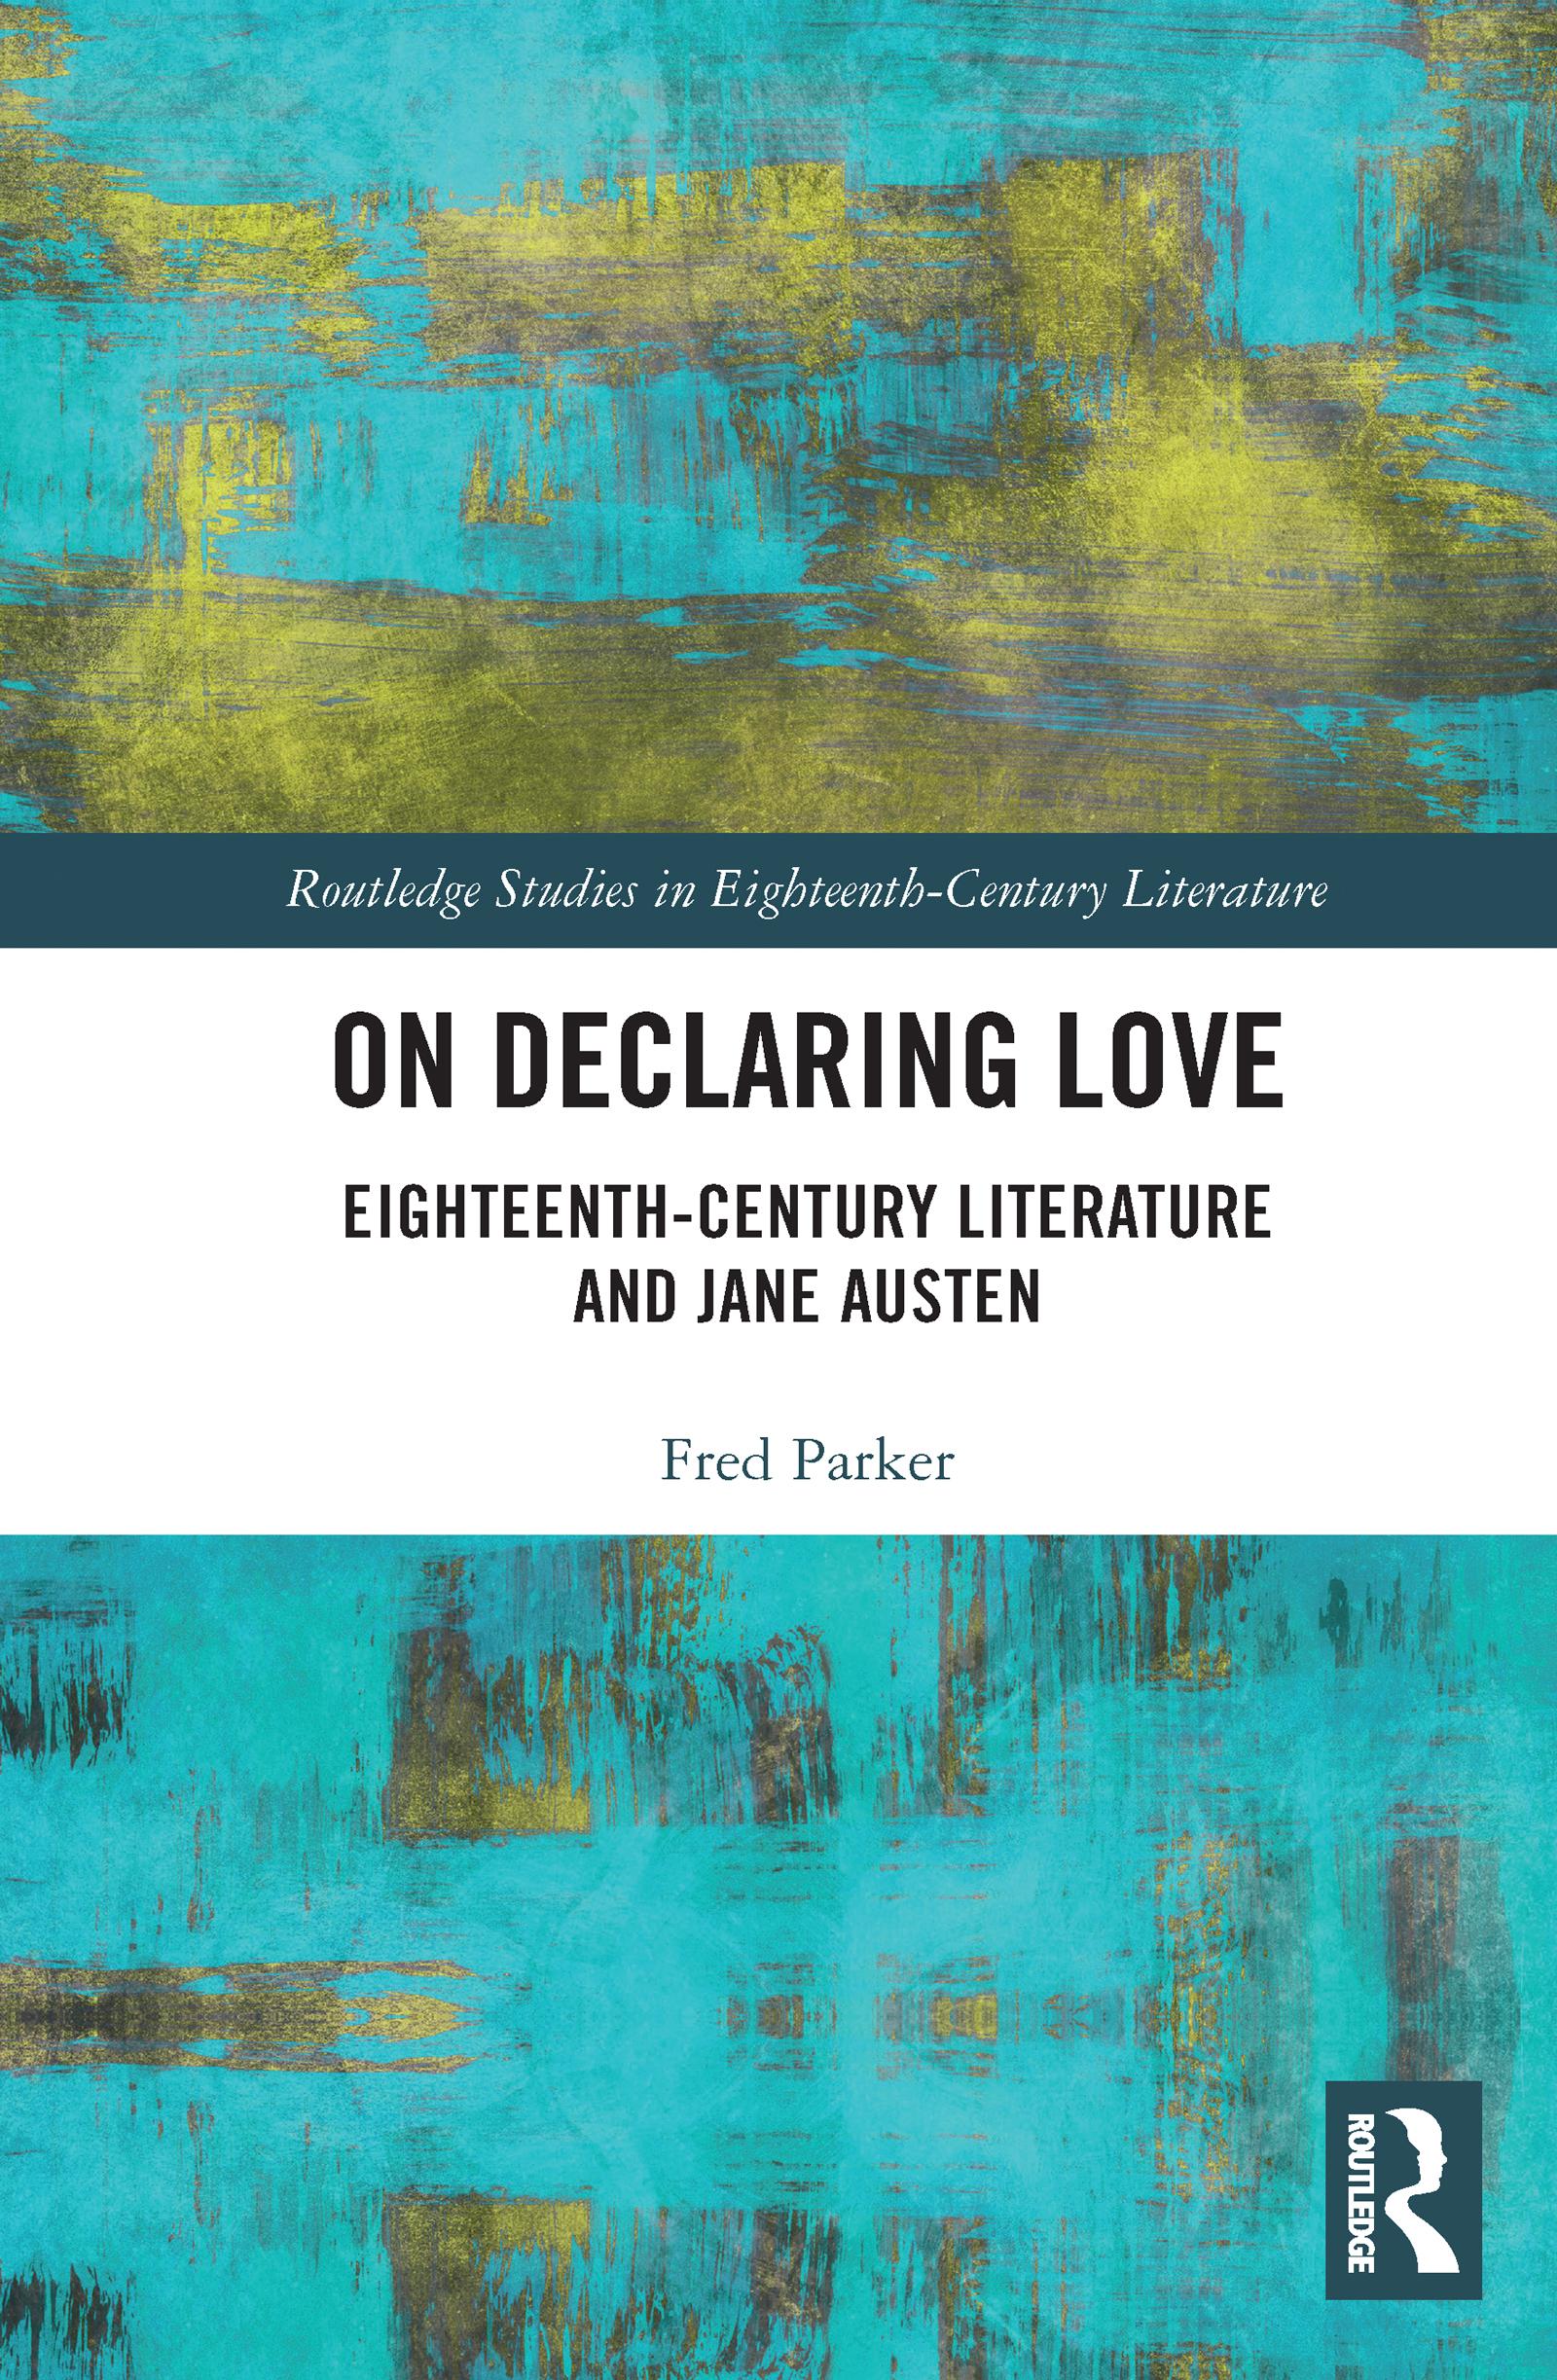 On Declaring Love